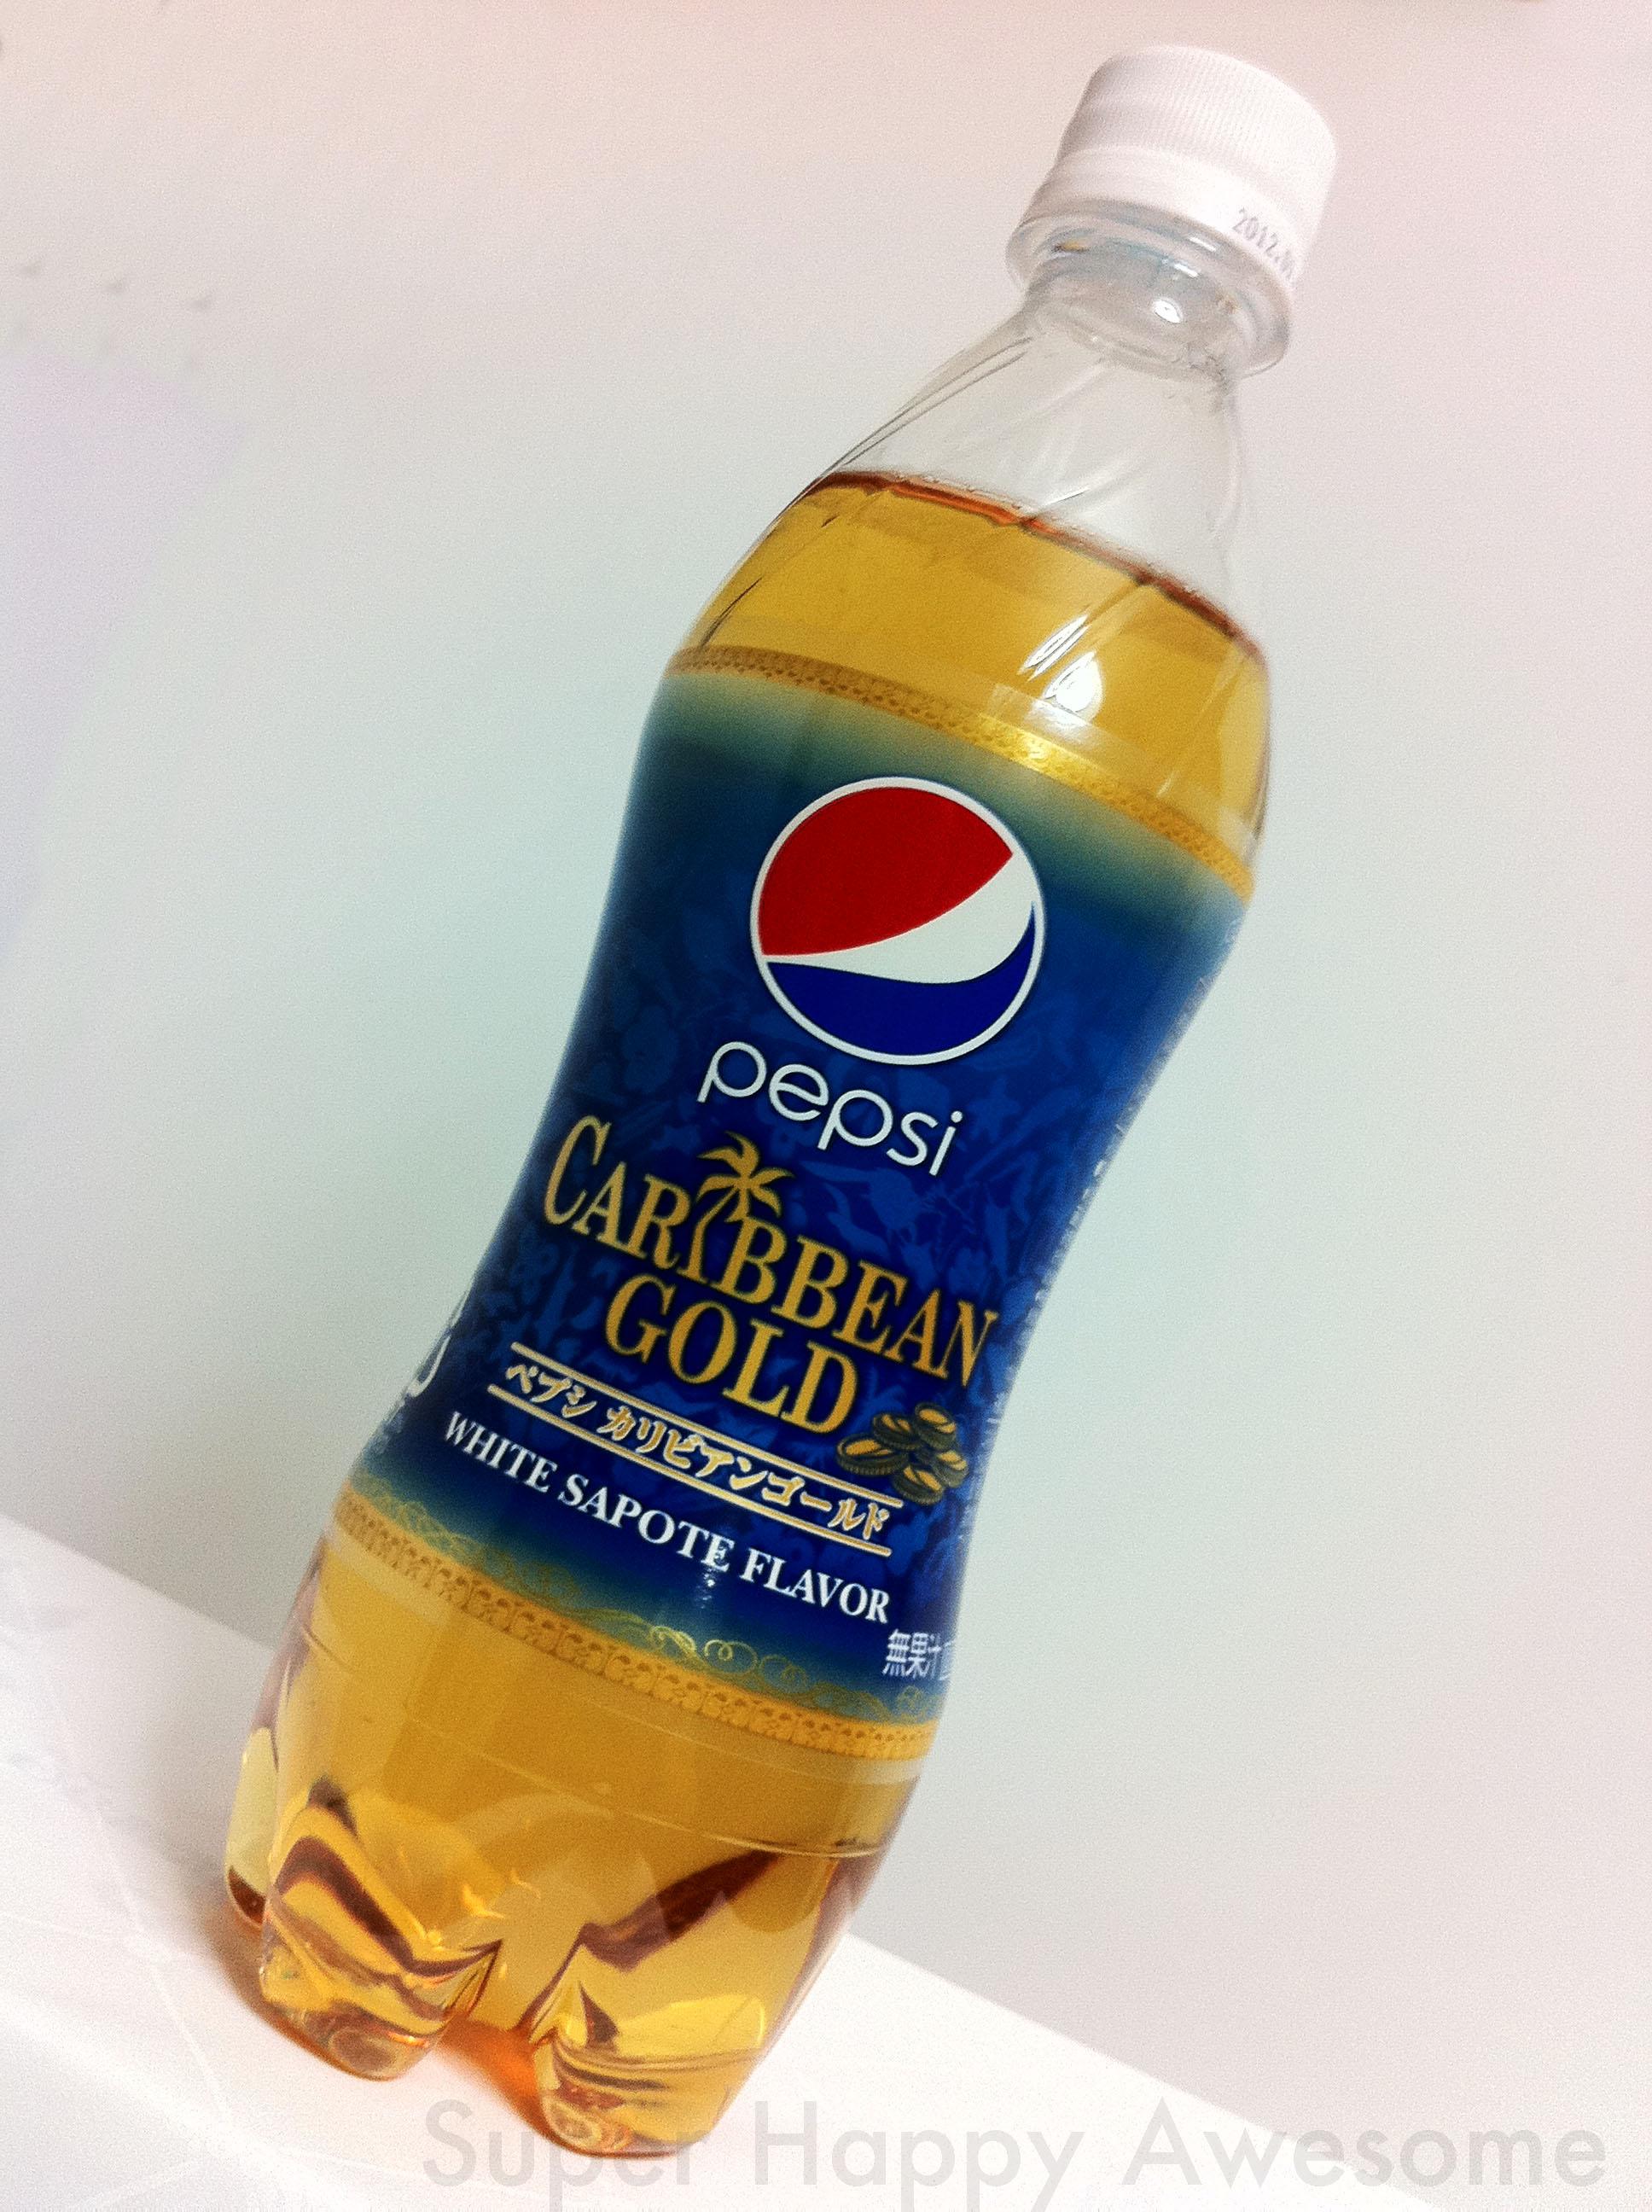 Protecting the Pepsi taste